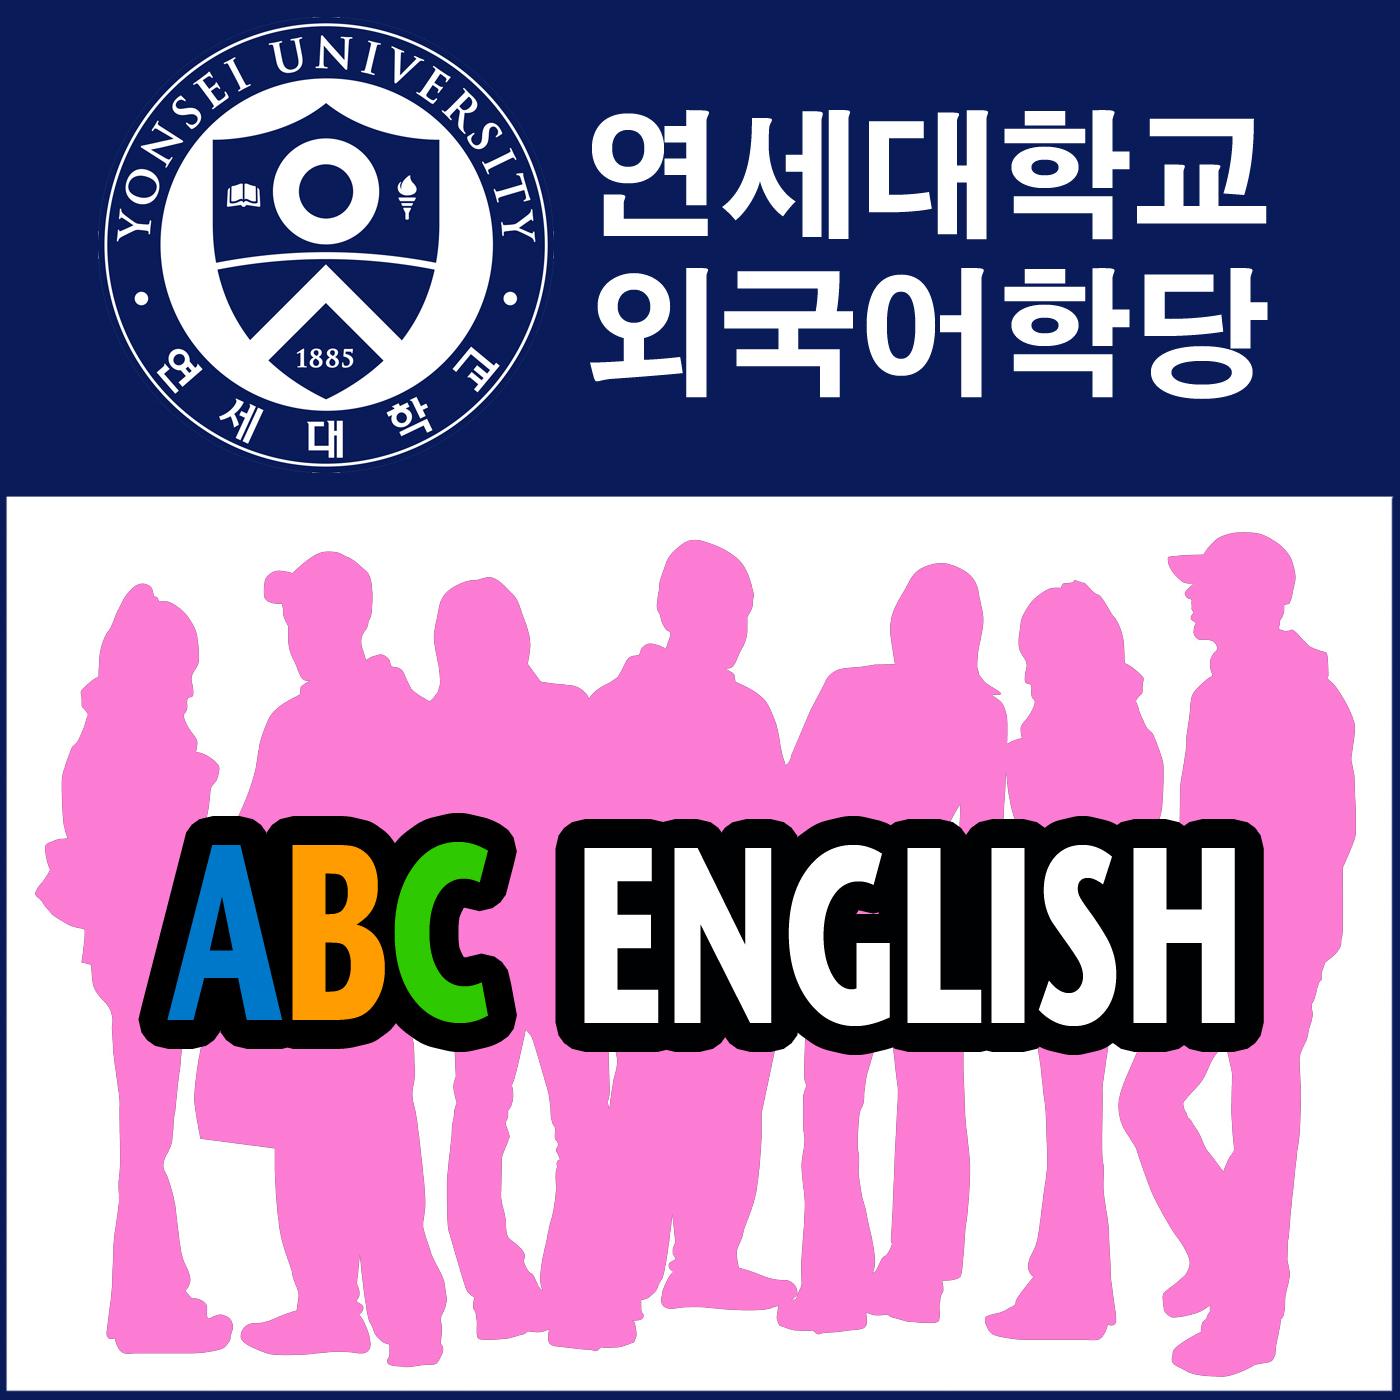 ABC English - 연세대학교 외국어학당